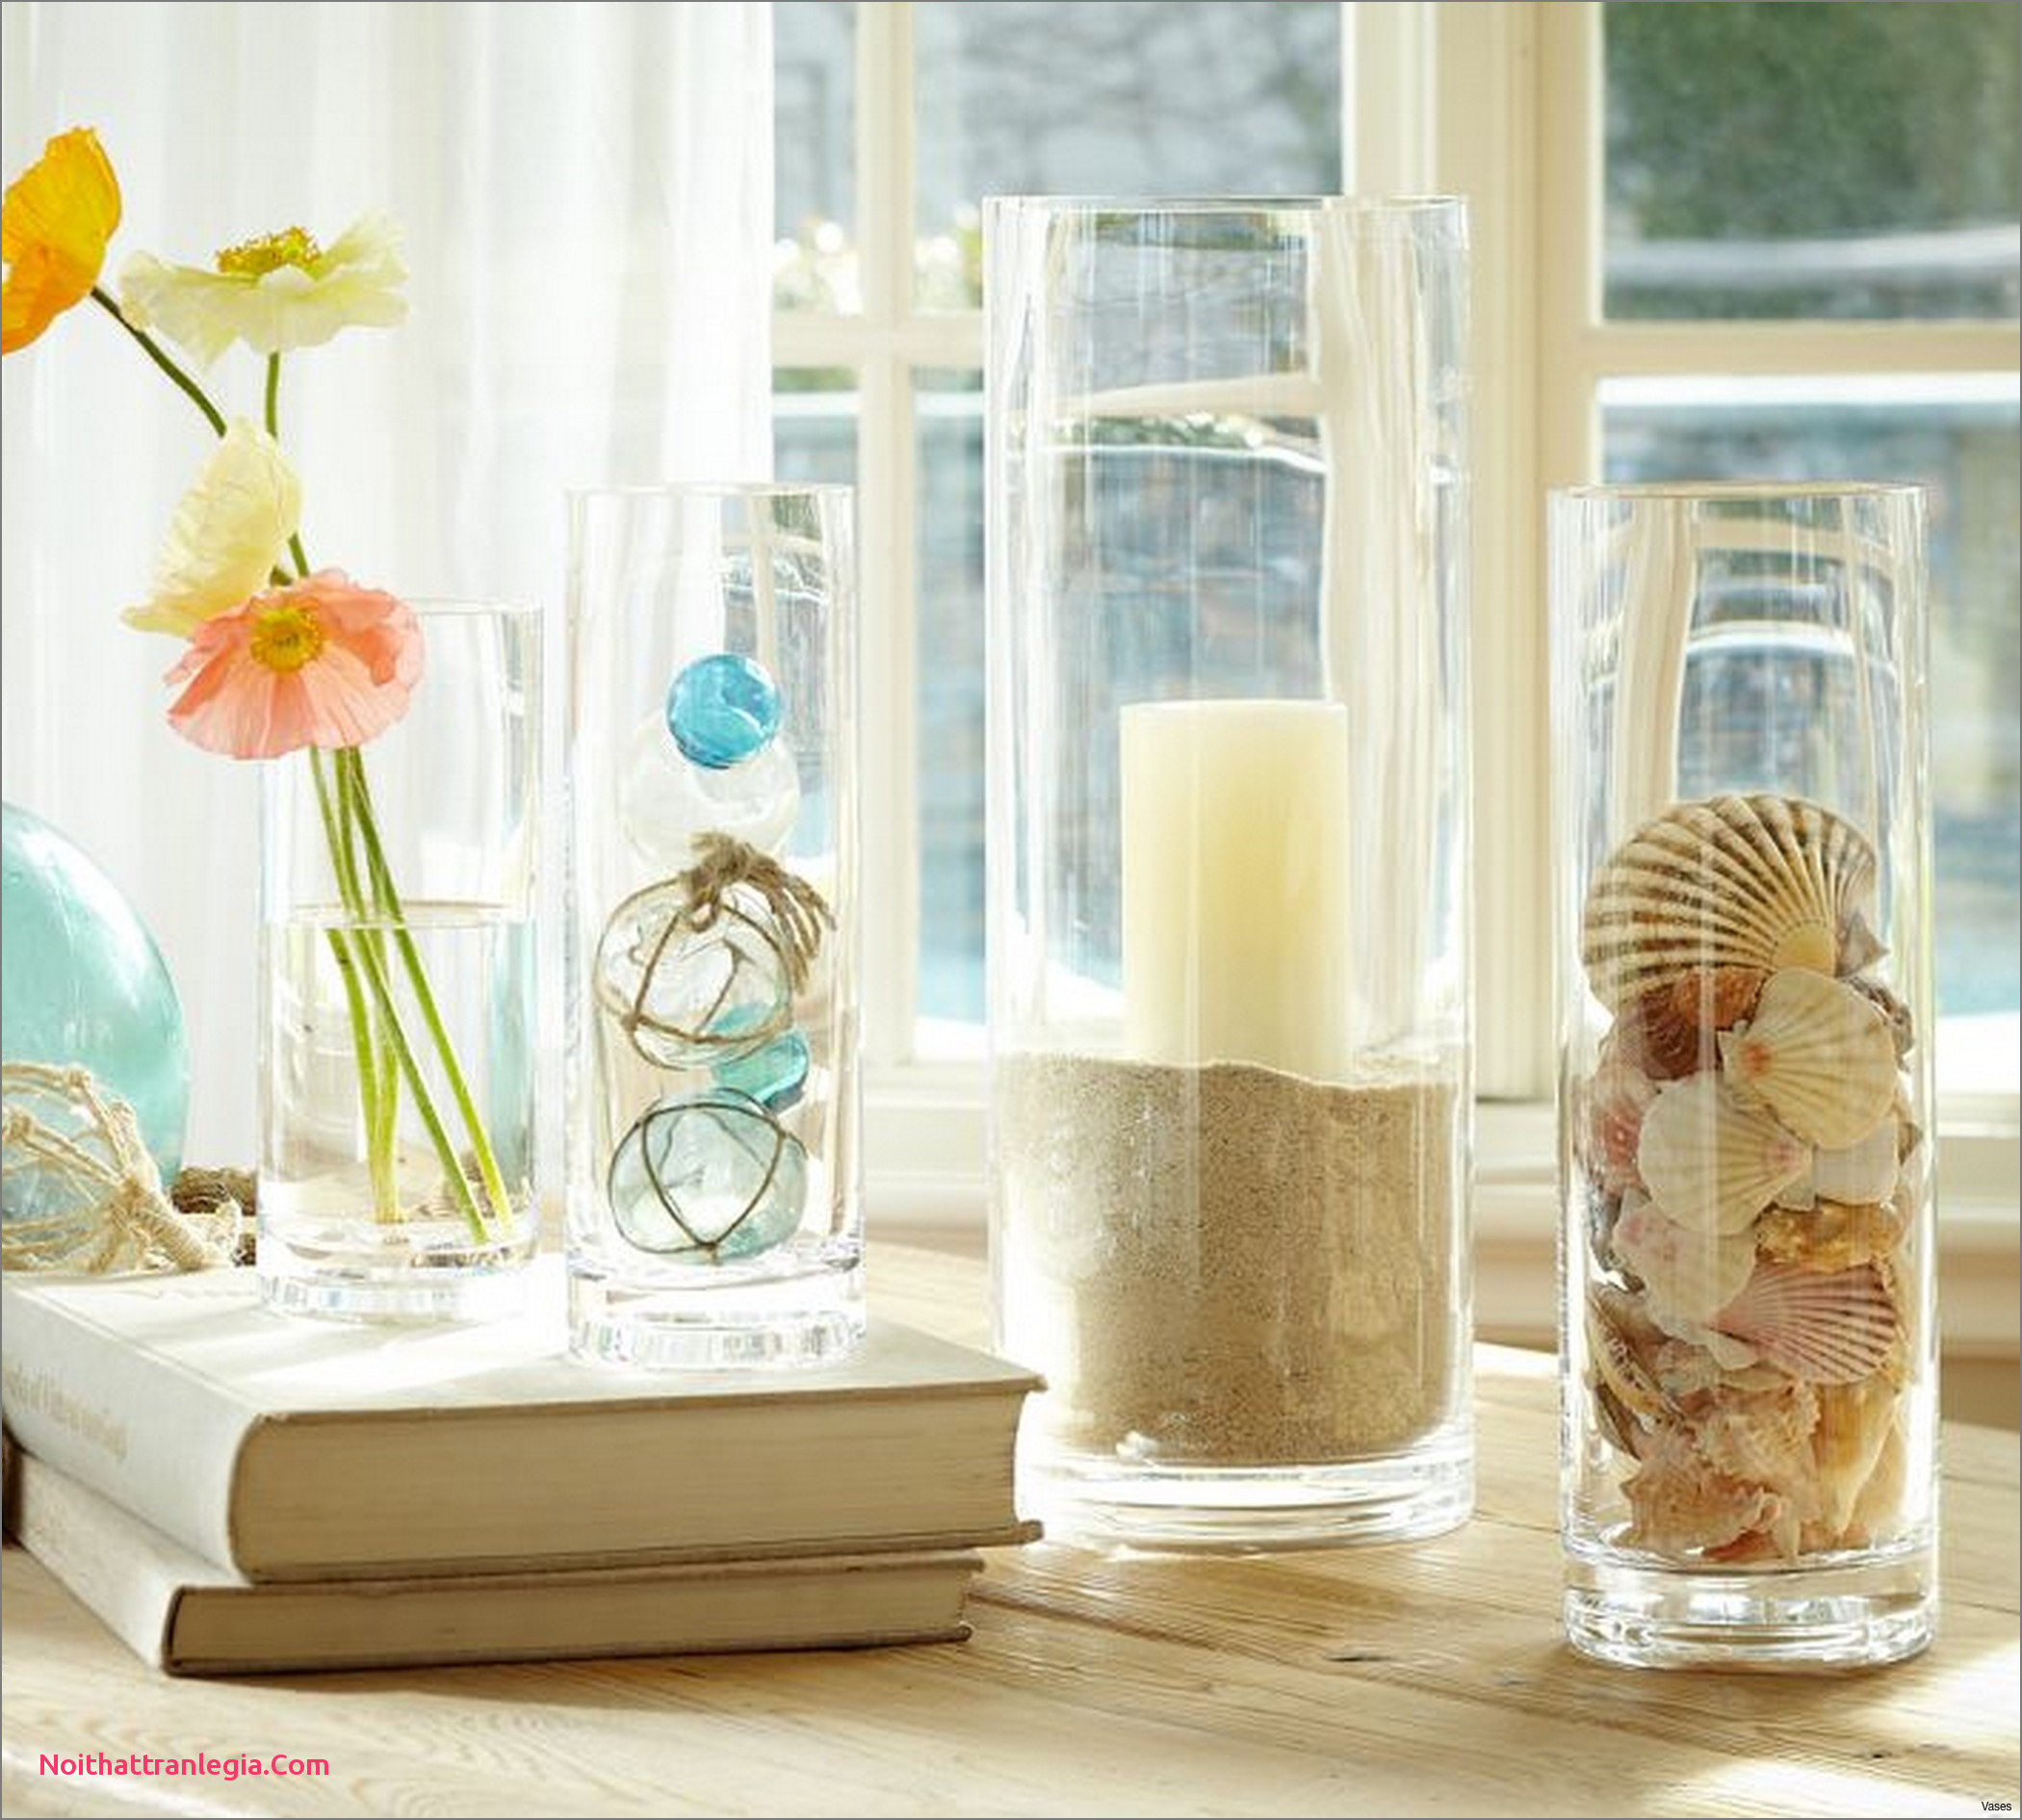 21 Best Blue Glass Vase 2021 free download blue glass vase of 20 how to make mercury glass vases noithattranlegia vases design within glass vase fillers vase filler ideas 5h vases summer 5i 0d inspiration vase